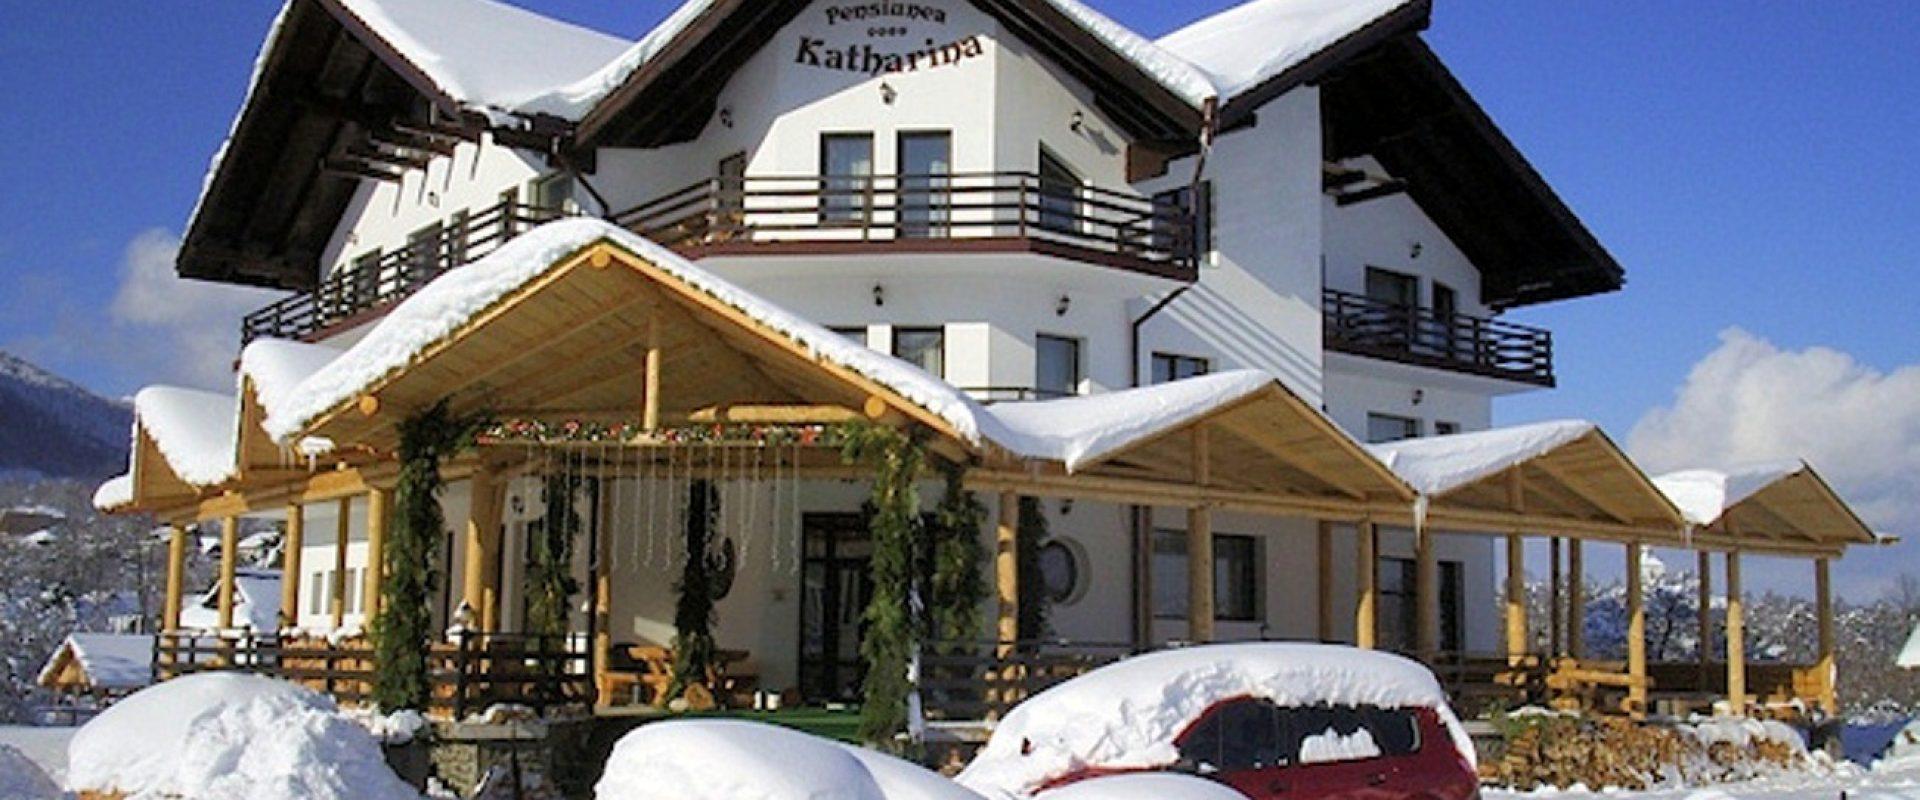 Vacanță la munte în România, Moeciu, Pensiunea Katharina